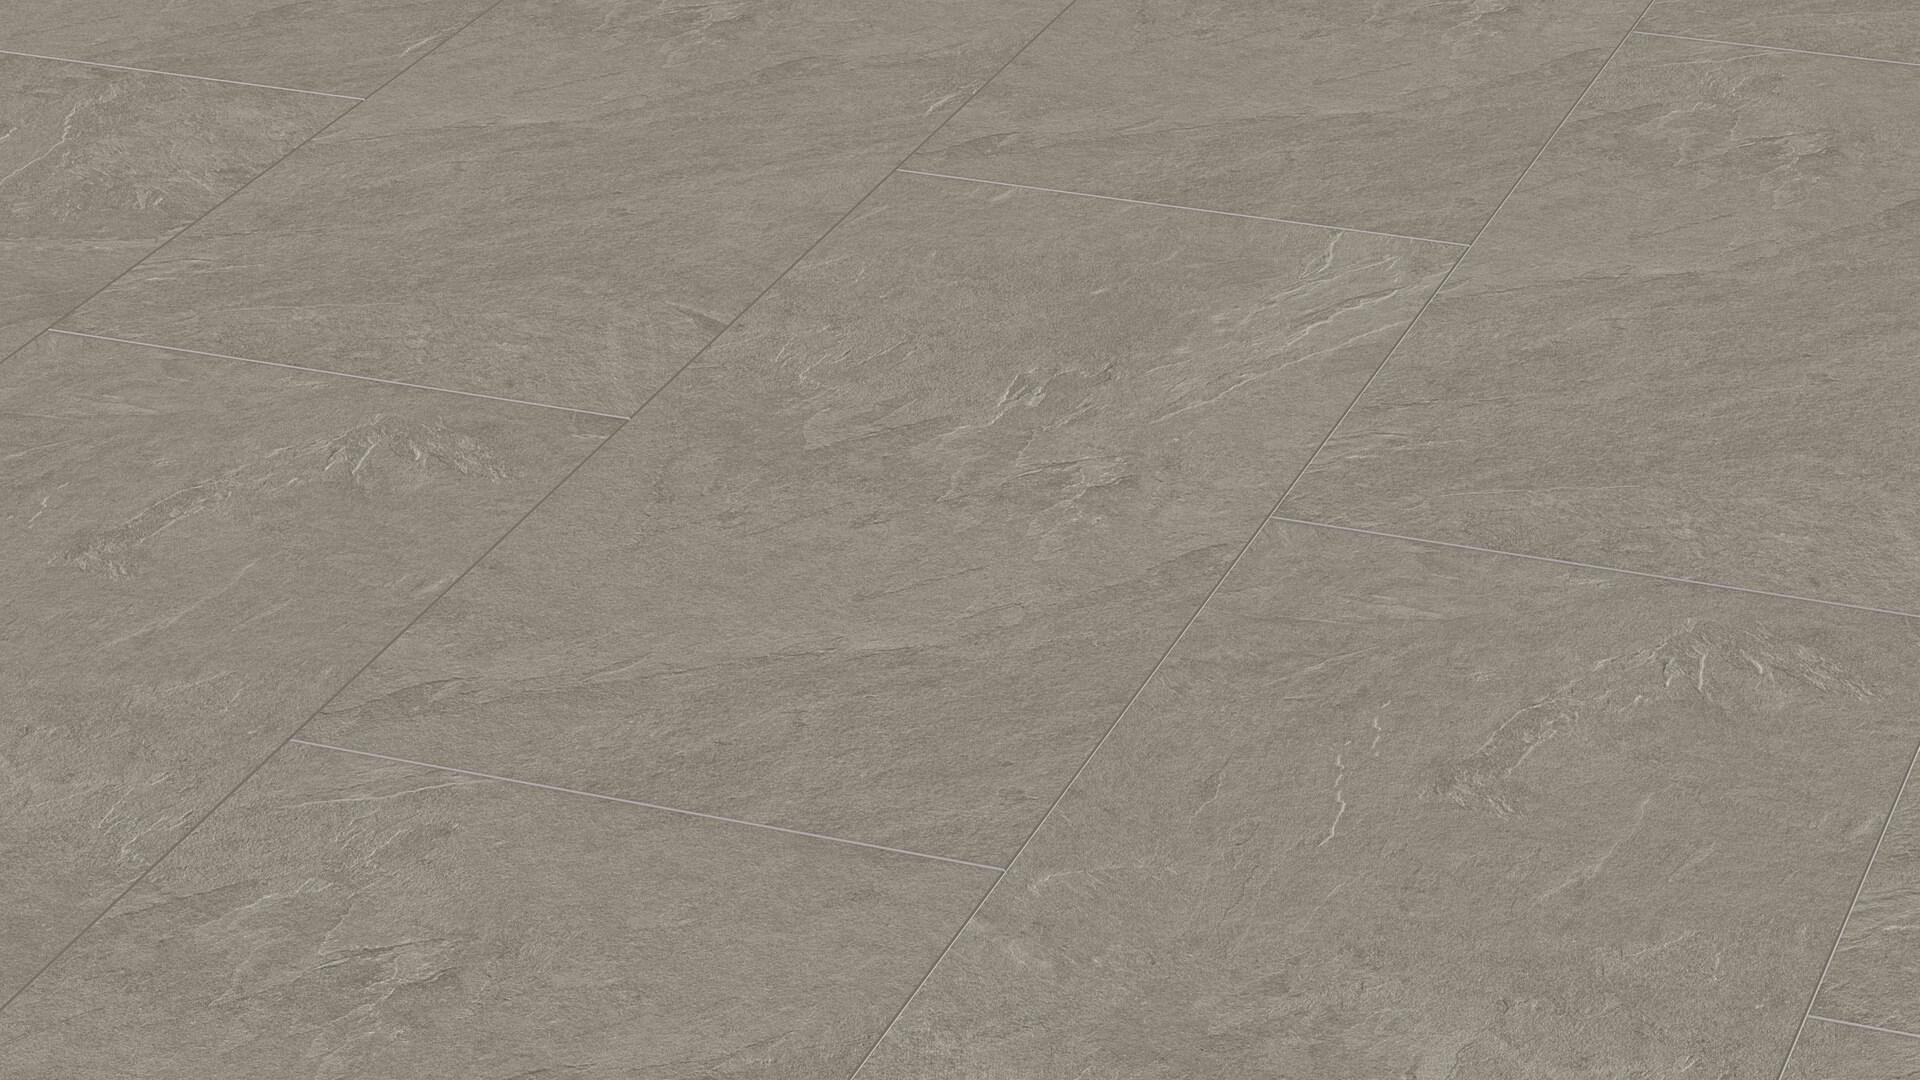 Laminat MeisterDesign. laminate LB 150 Schiefer grau 6136